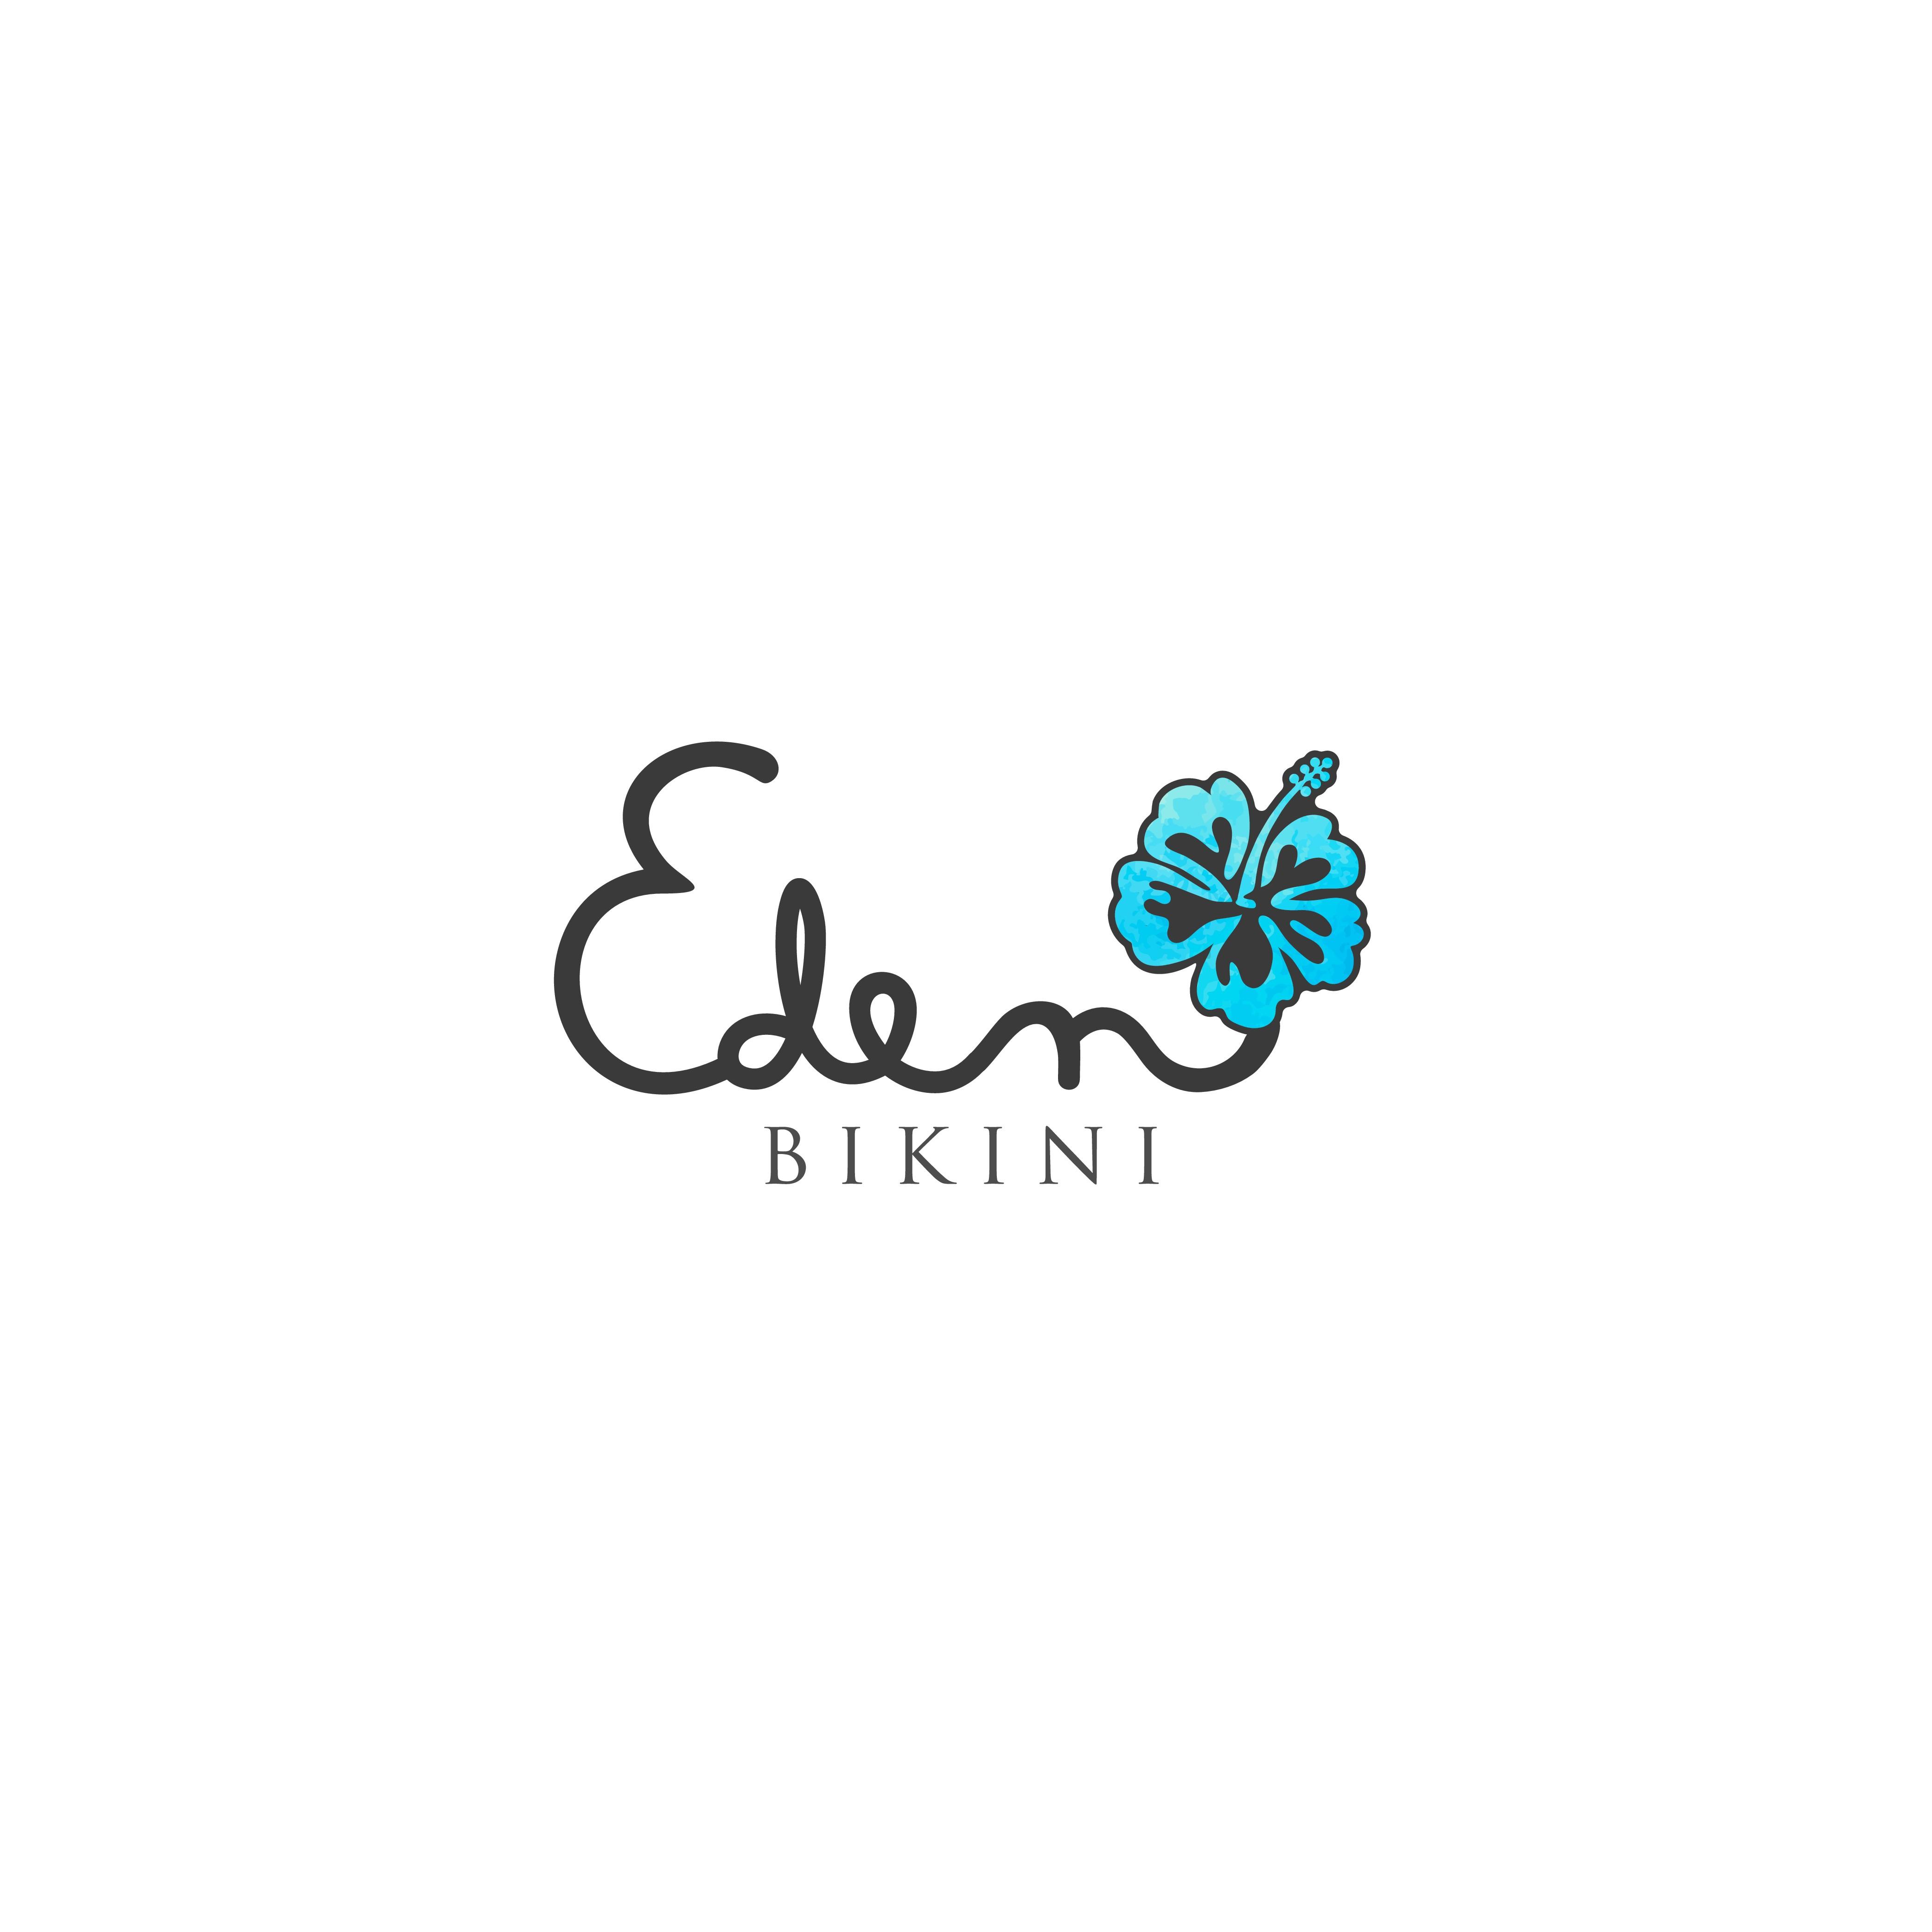 Eden Bikini - Create a Logo for our e-commerce